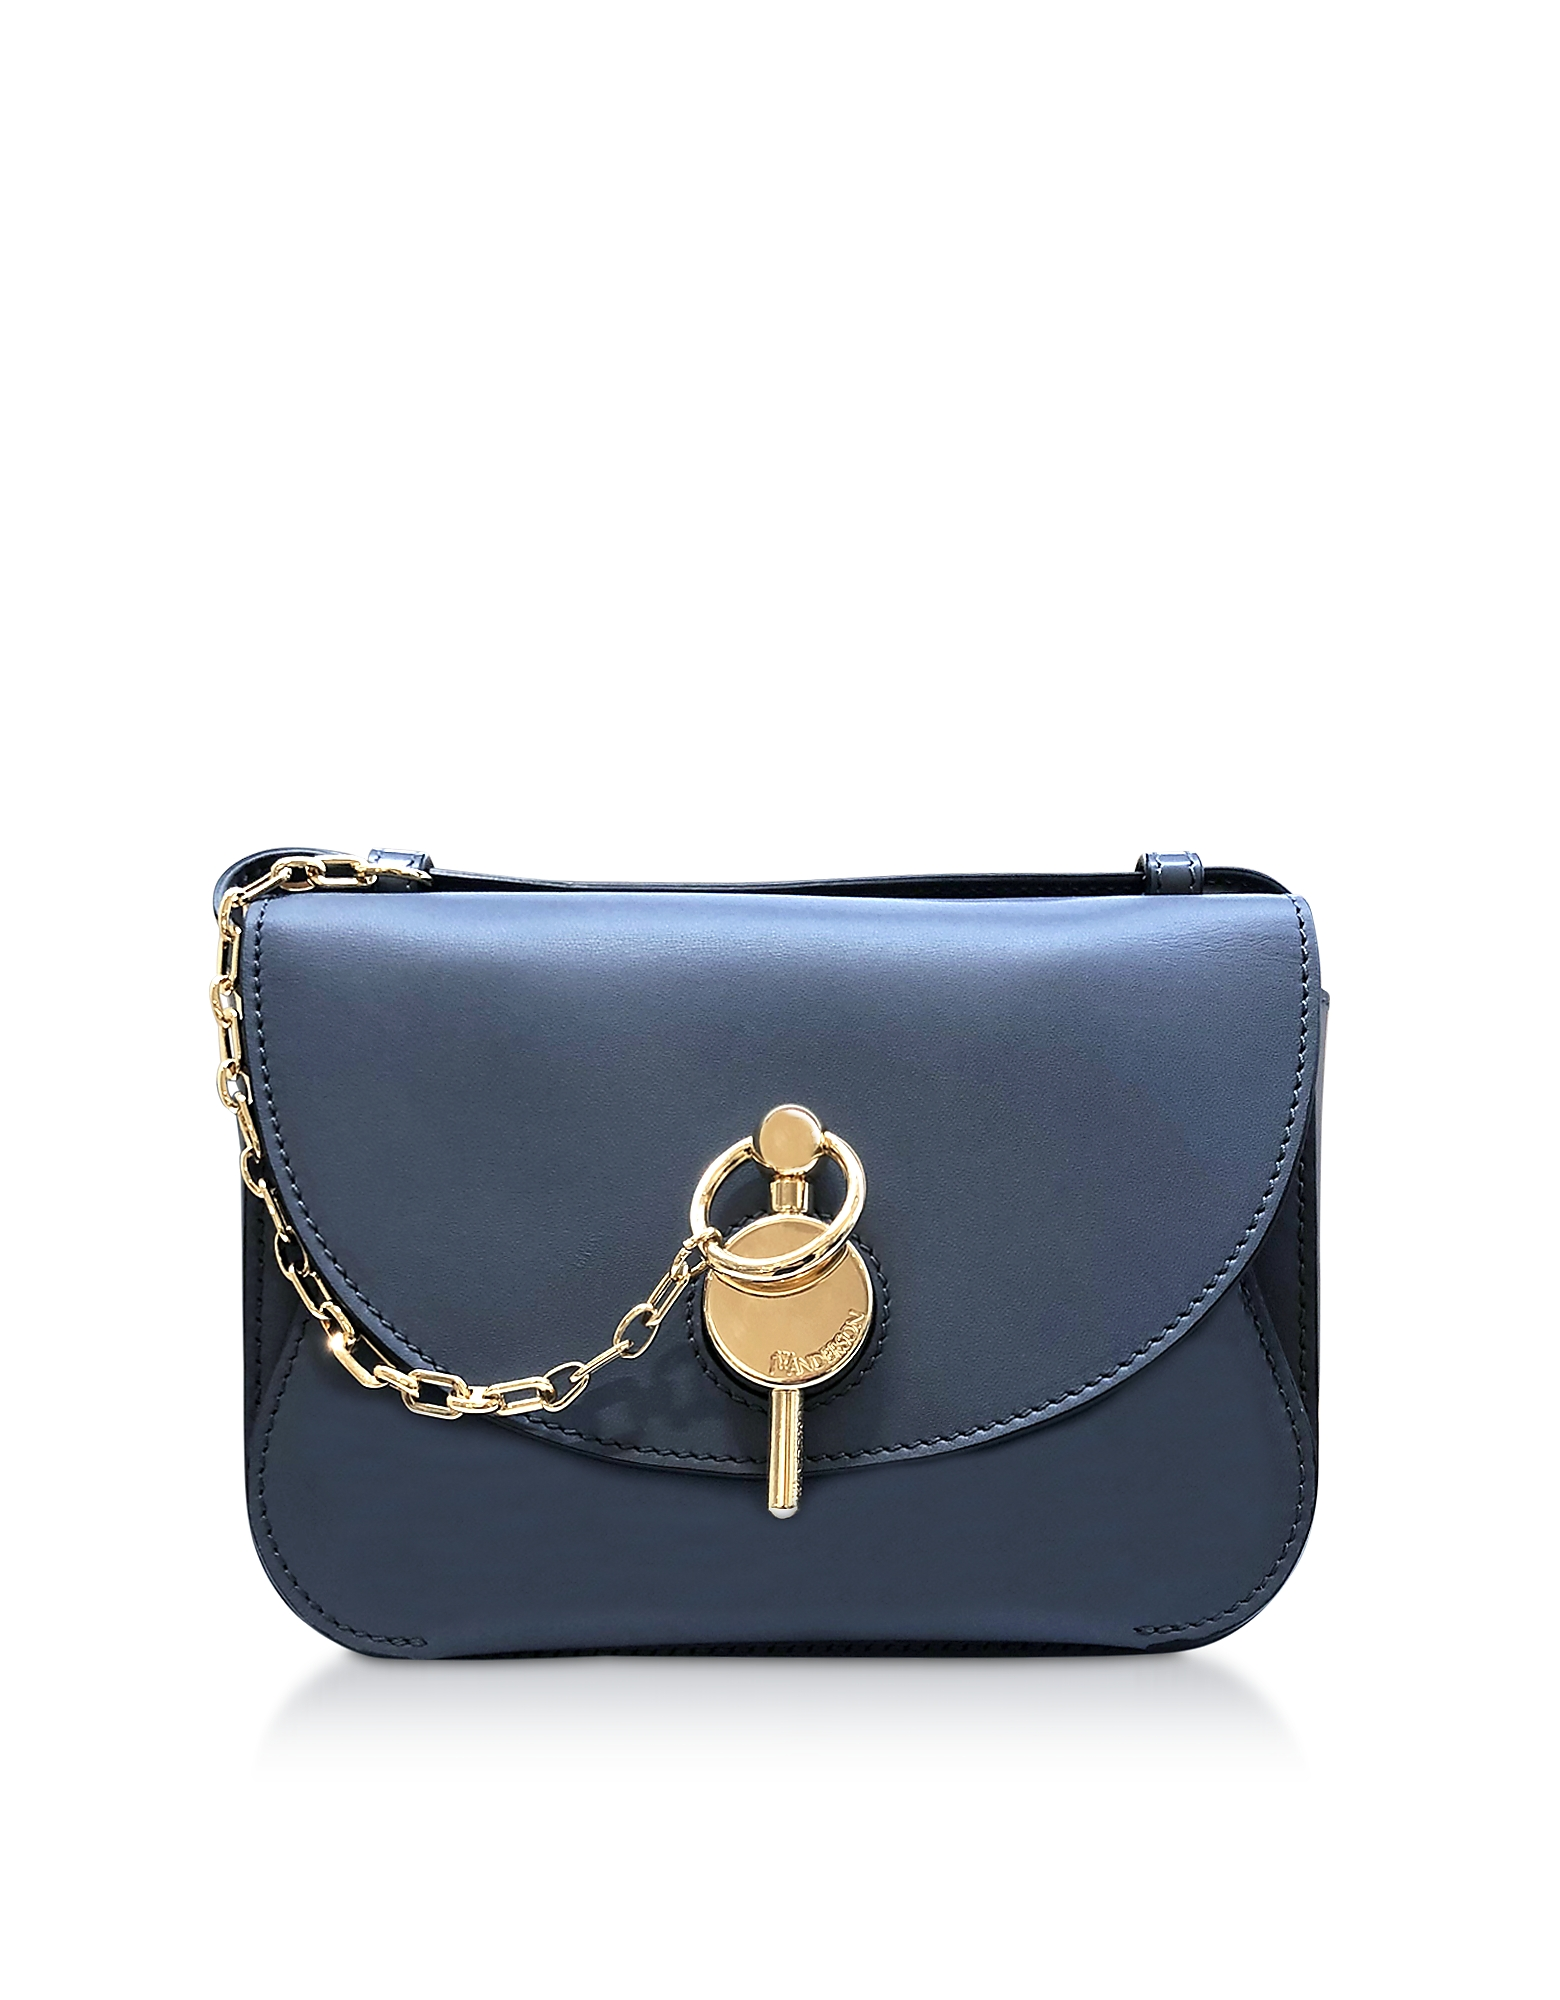 Mini Keyts Bag, Dark gray